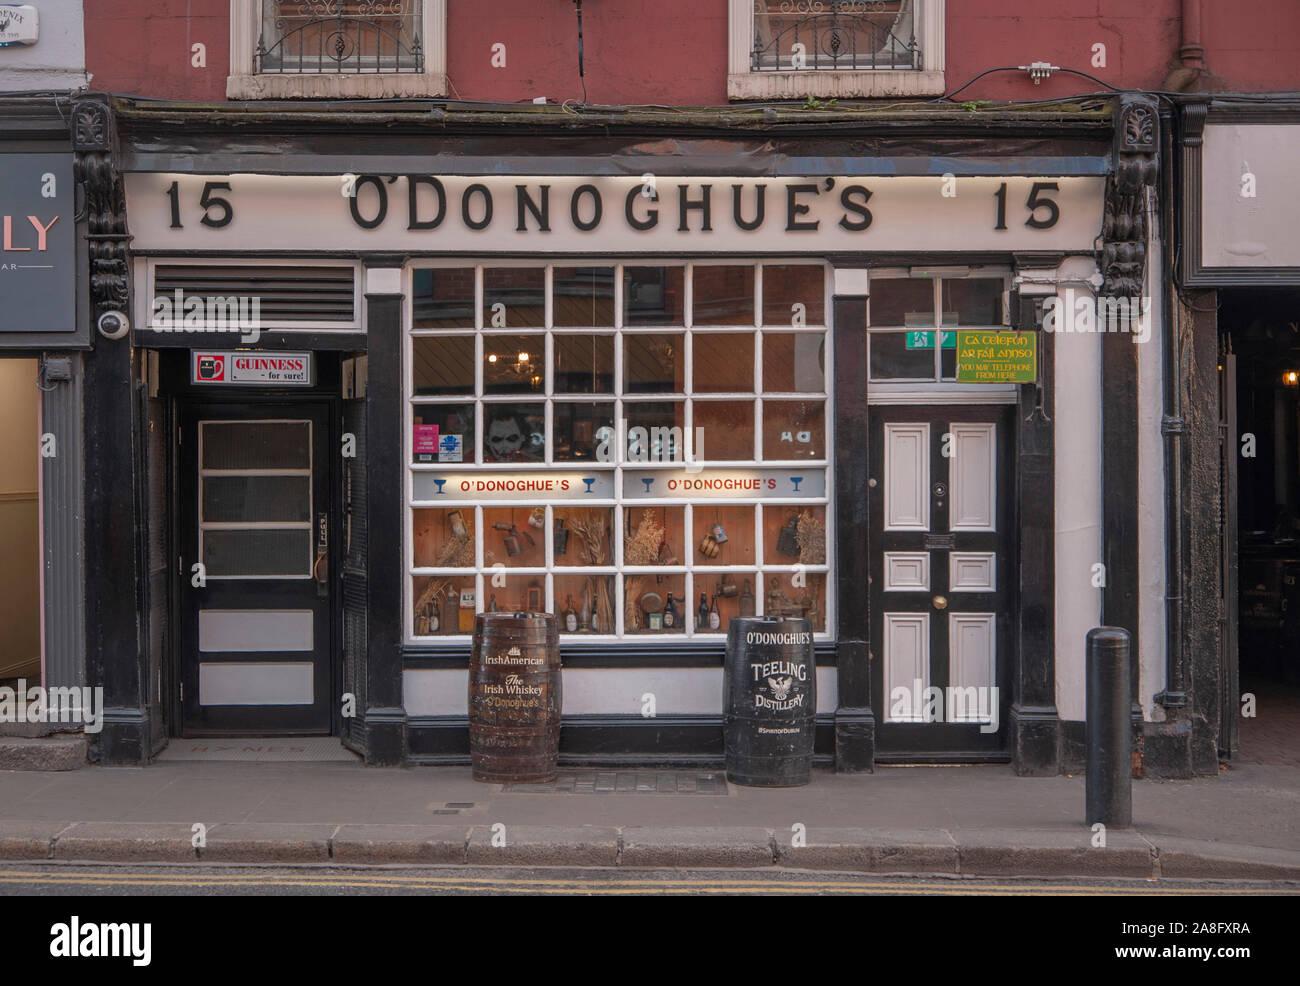 O'Donoghue's public house in Dublin Ireland Stock Photo